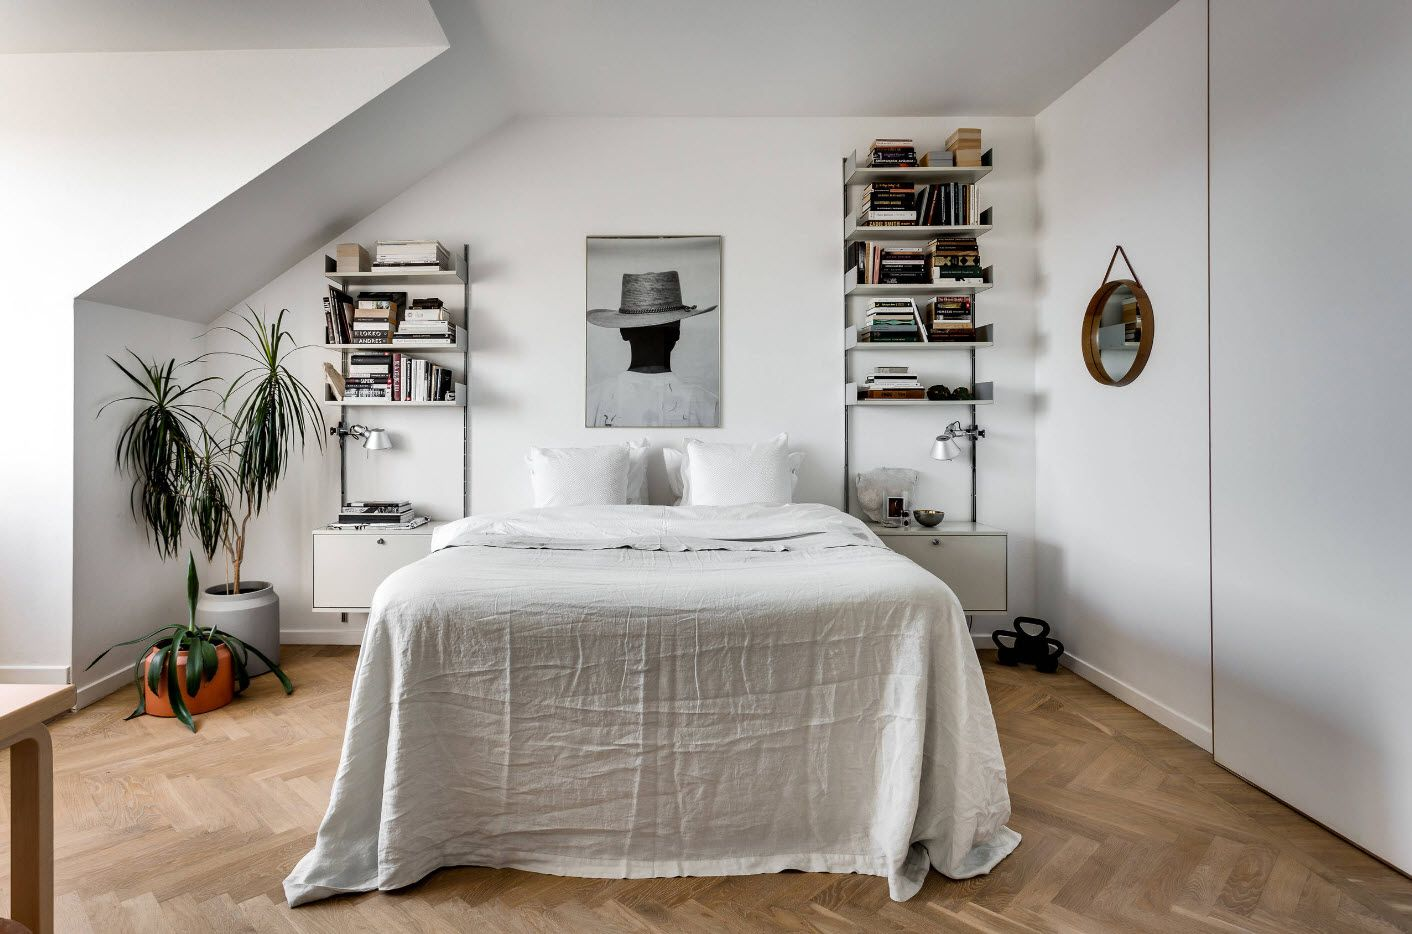 Modern Bedroom Interior Decoration & Design Ideas 2017. Scandinavian style in the loft small space